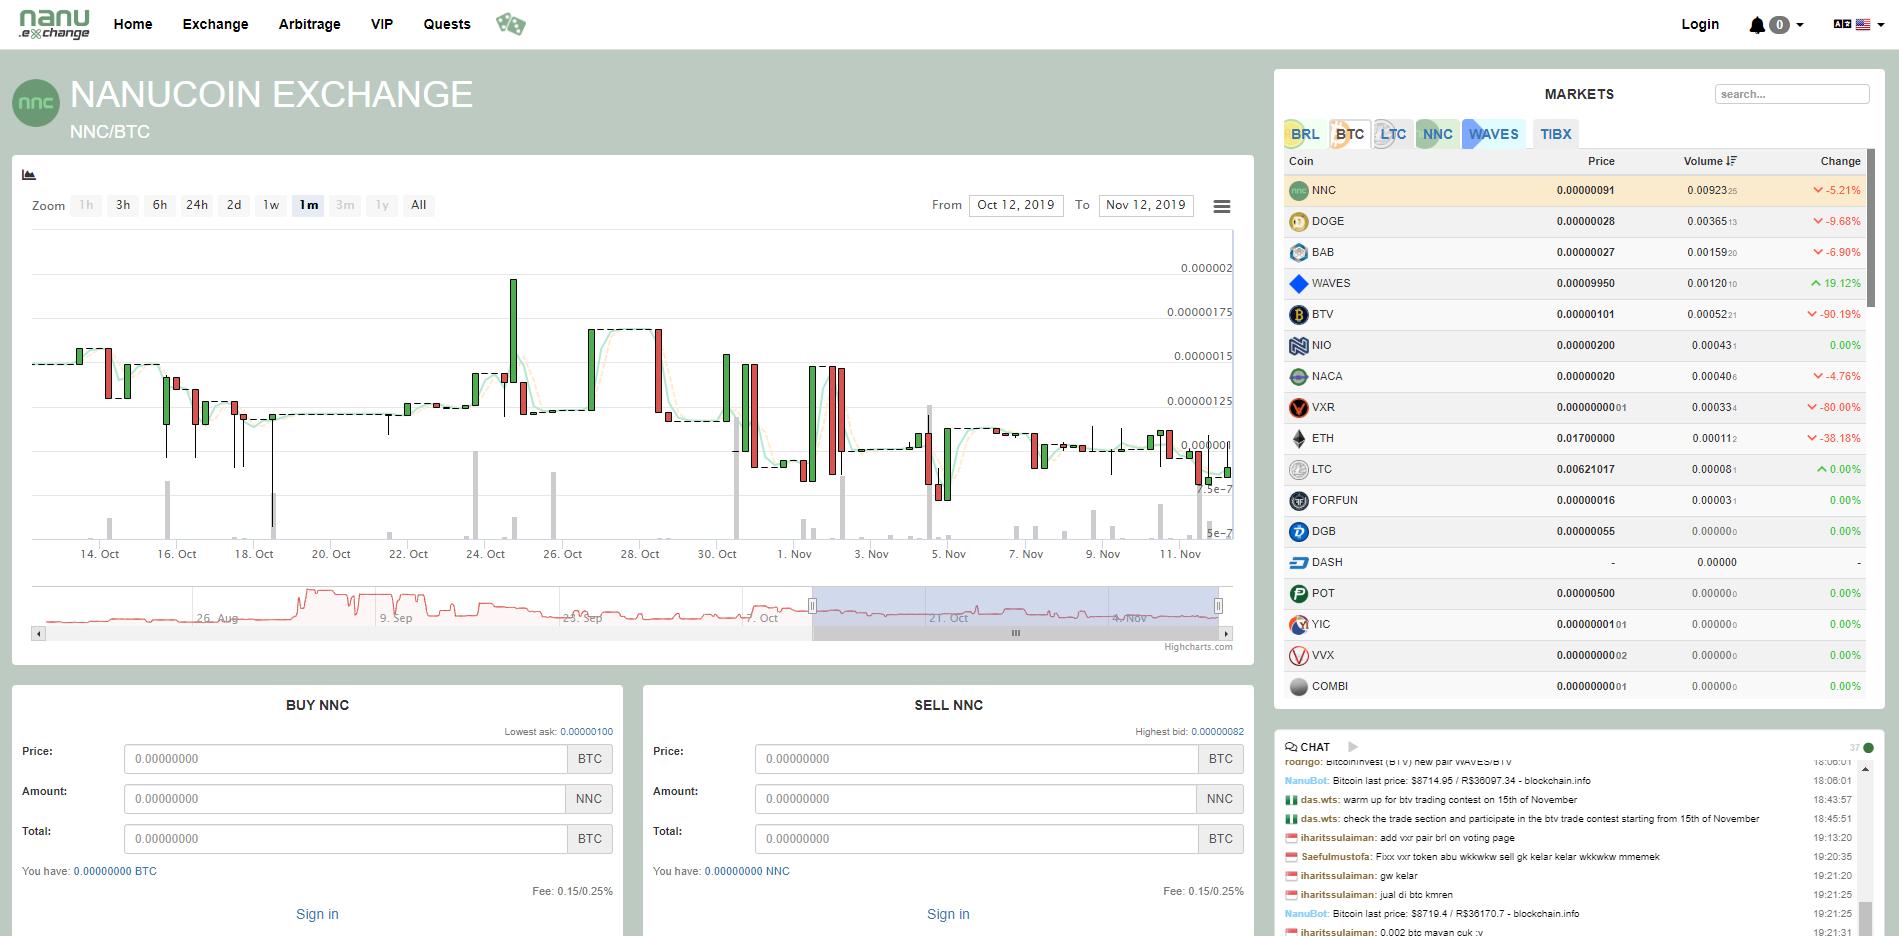 Nanu Exchange Trading View